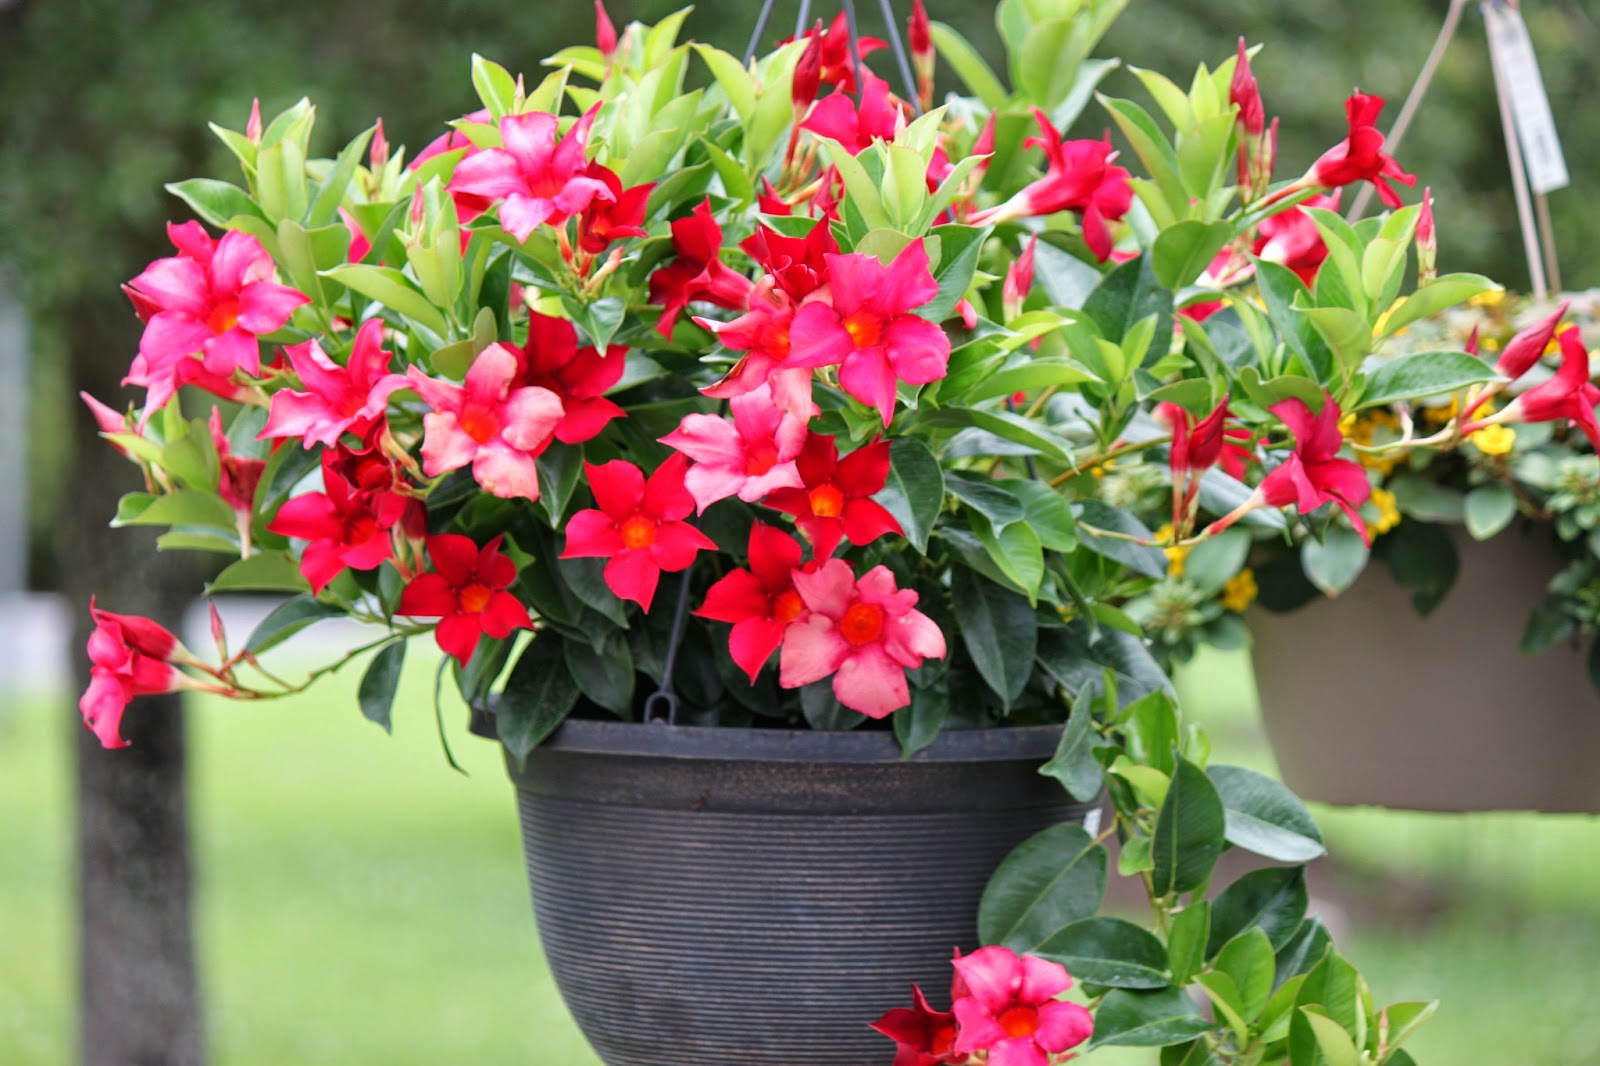 Savannah S Secret Gardens Summer Has Arrived With